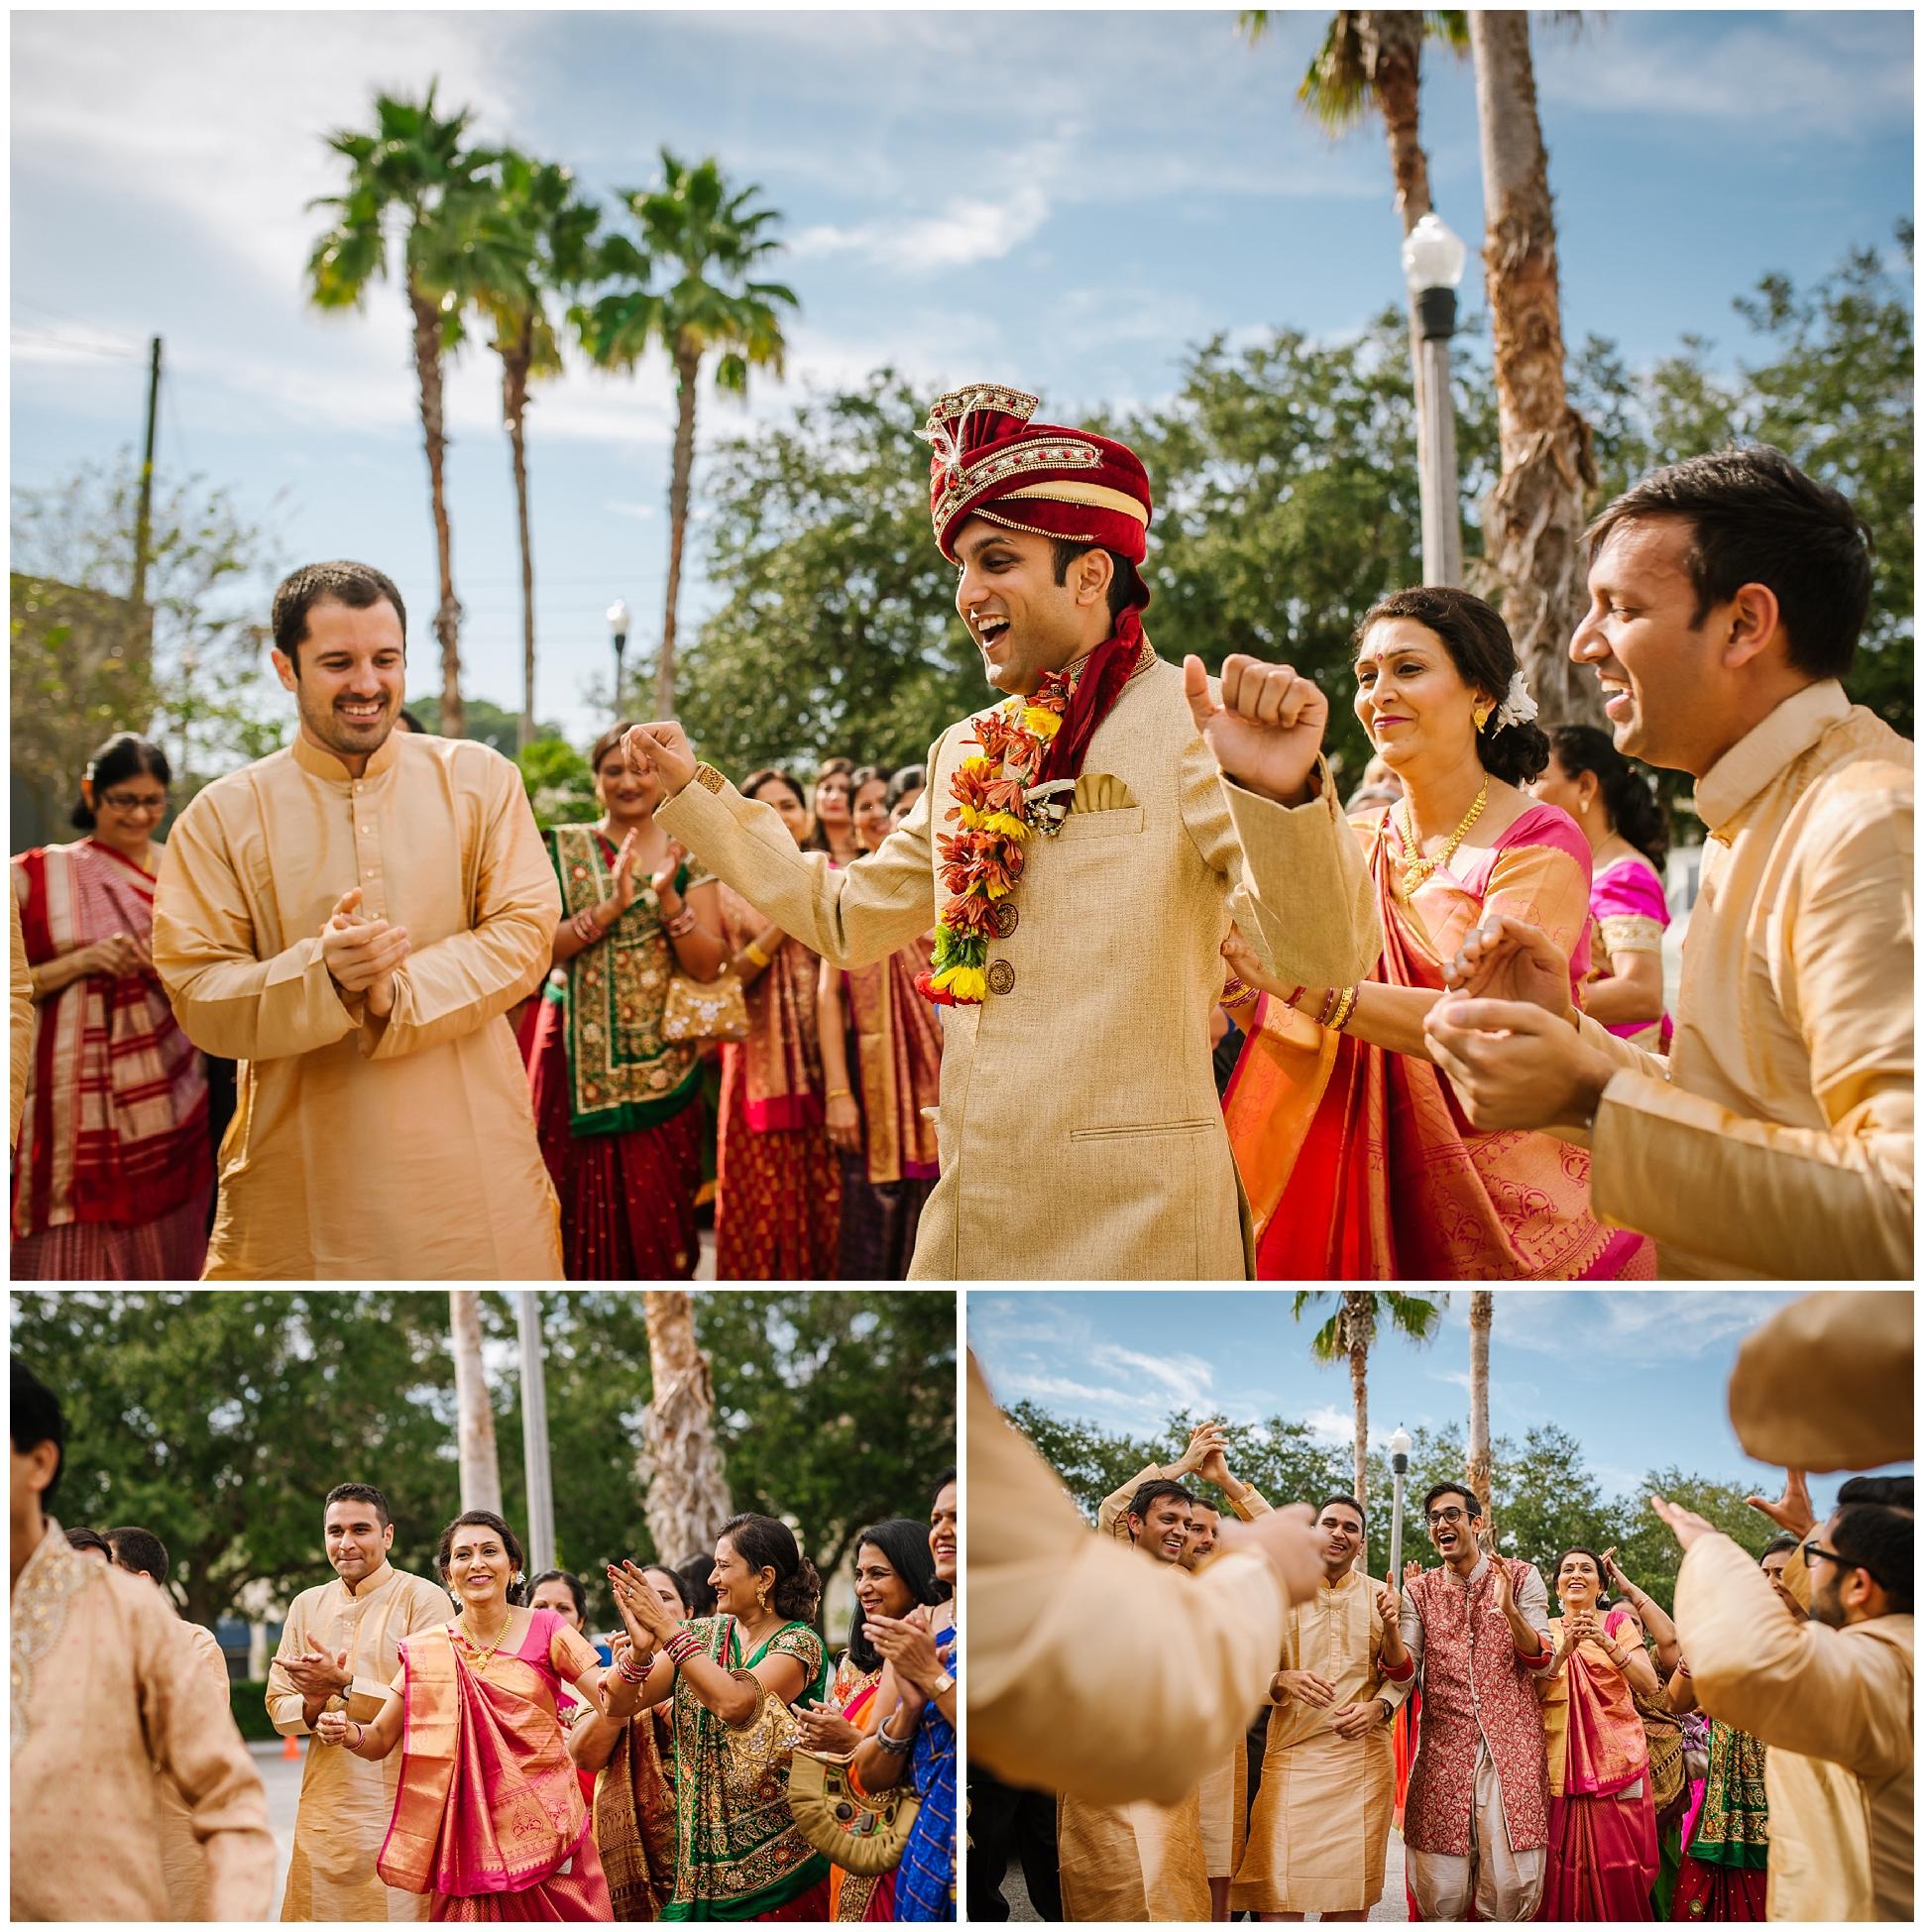 St-pete-indian-wedding-photographer-barat-sunken-gardens_0091.jpg